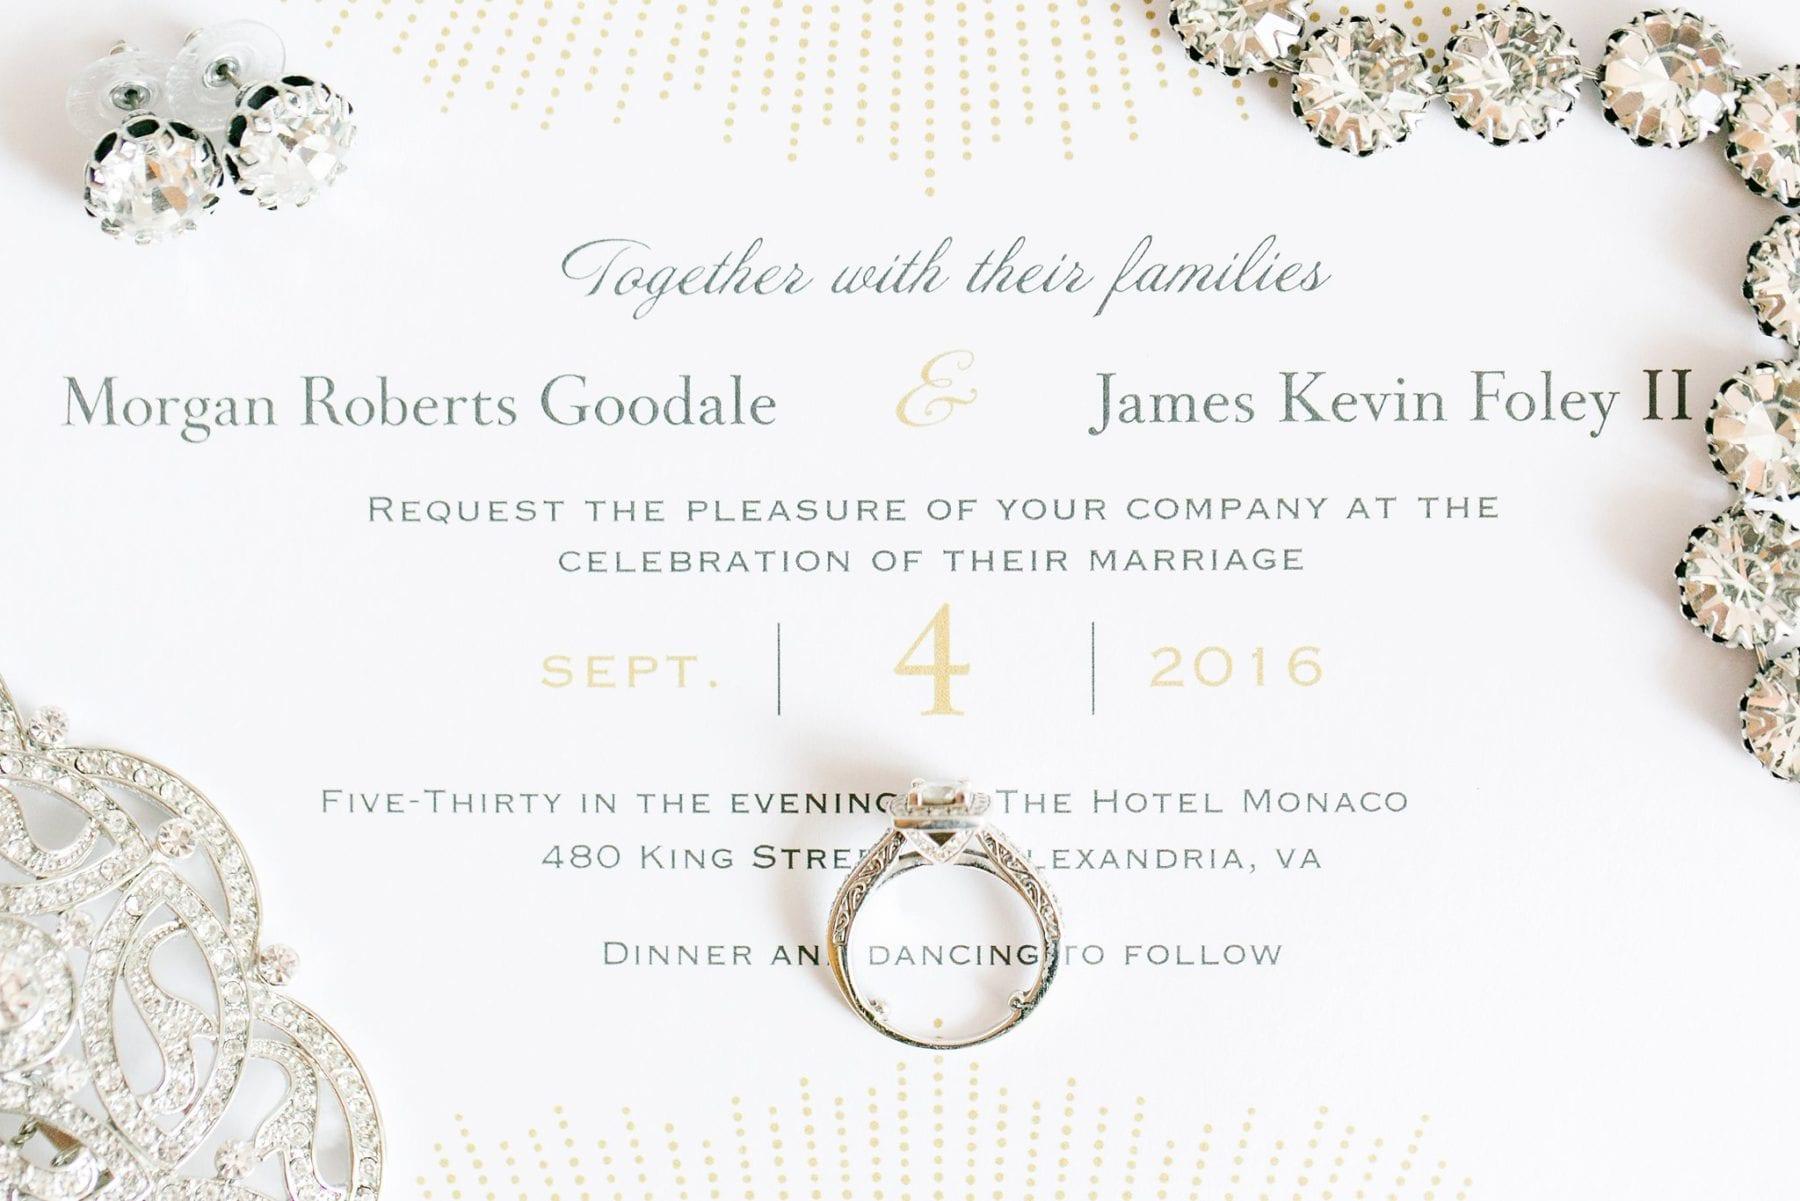 Hotel Monaco Wedding Photos Virginia Wedding Photographer Megan Kelsey Photography Kevin & Morgan-10.JPG